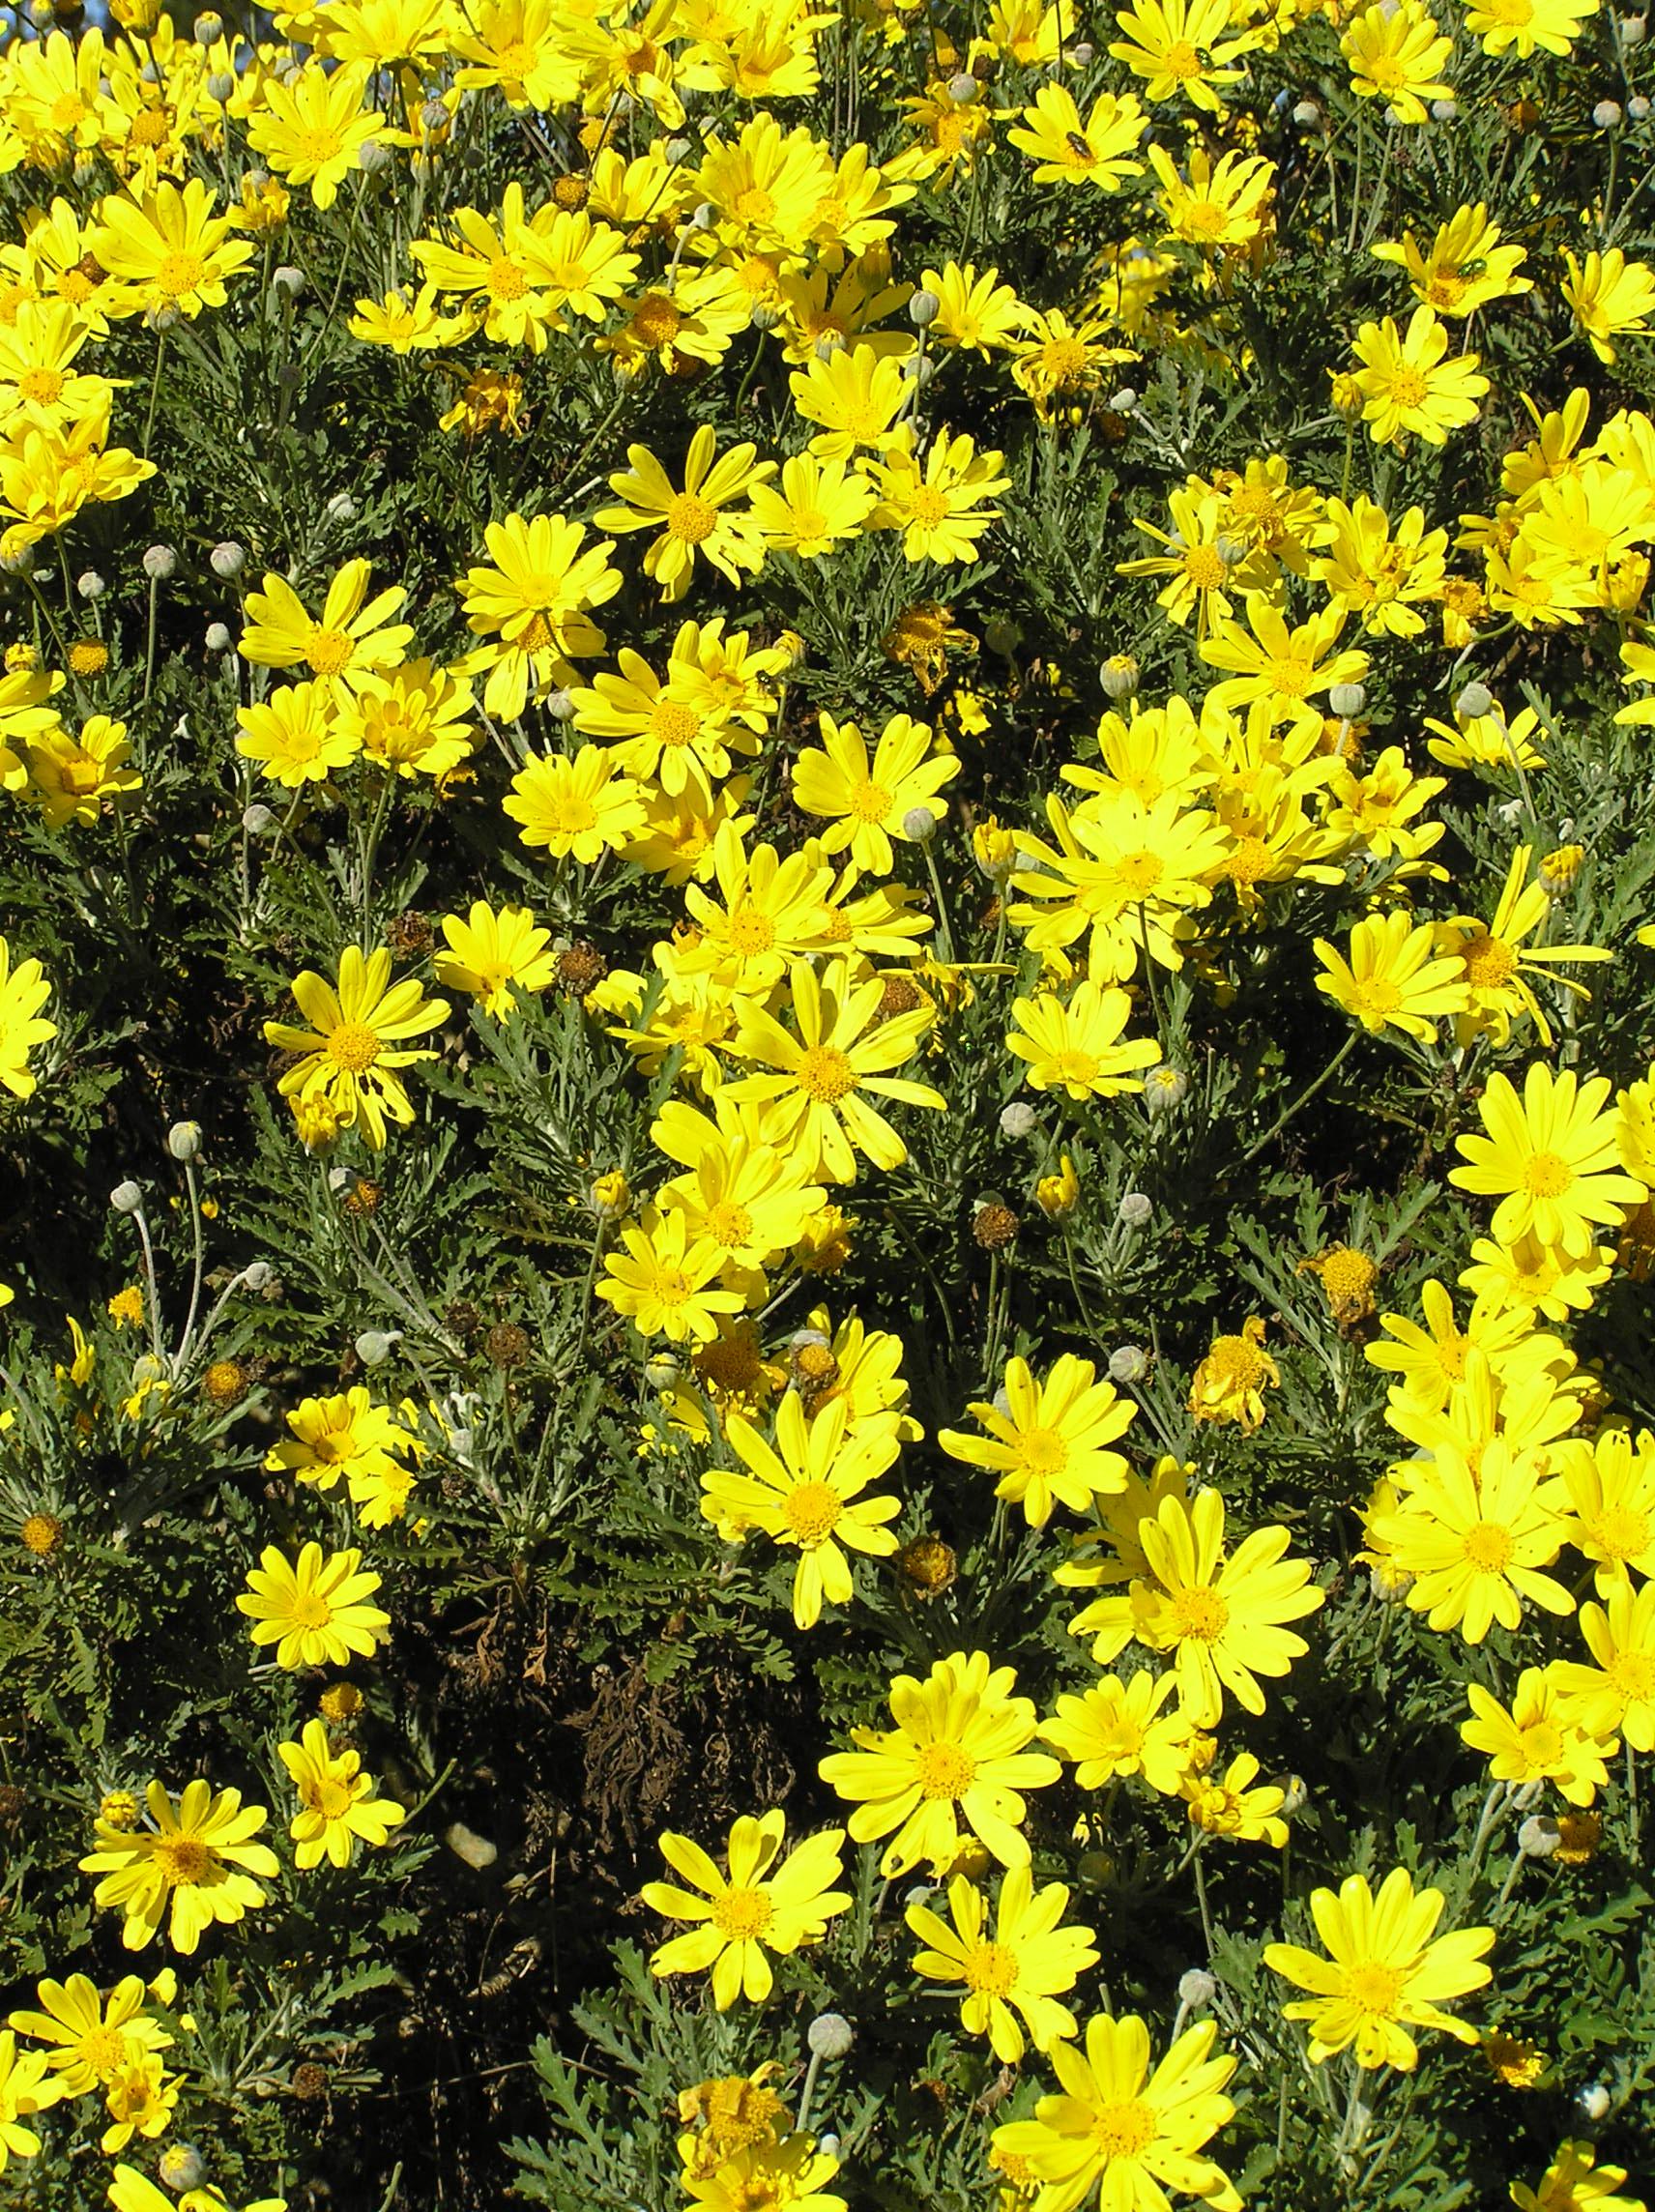 Golden daisy euryops pectinatus life is a garden golden daisy euryops pectinatus izmirmasajfo